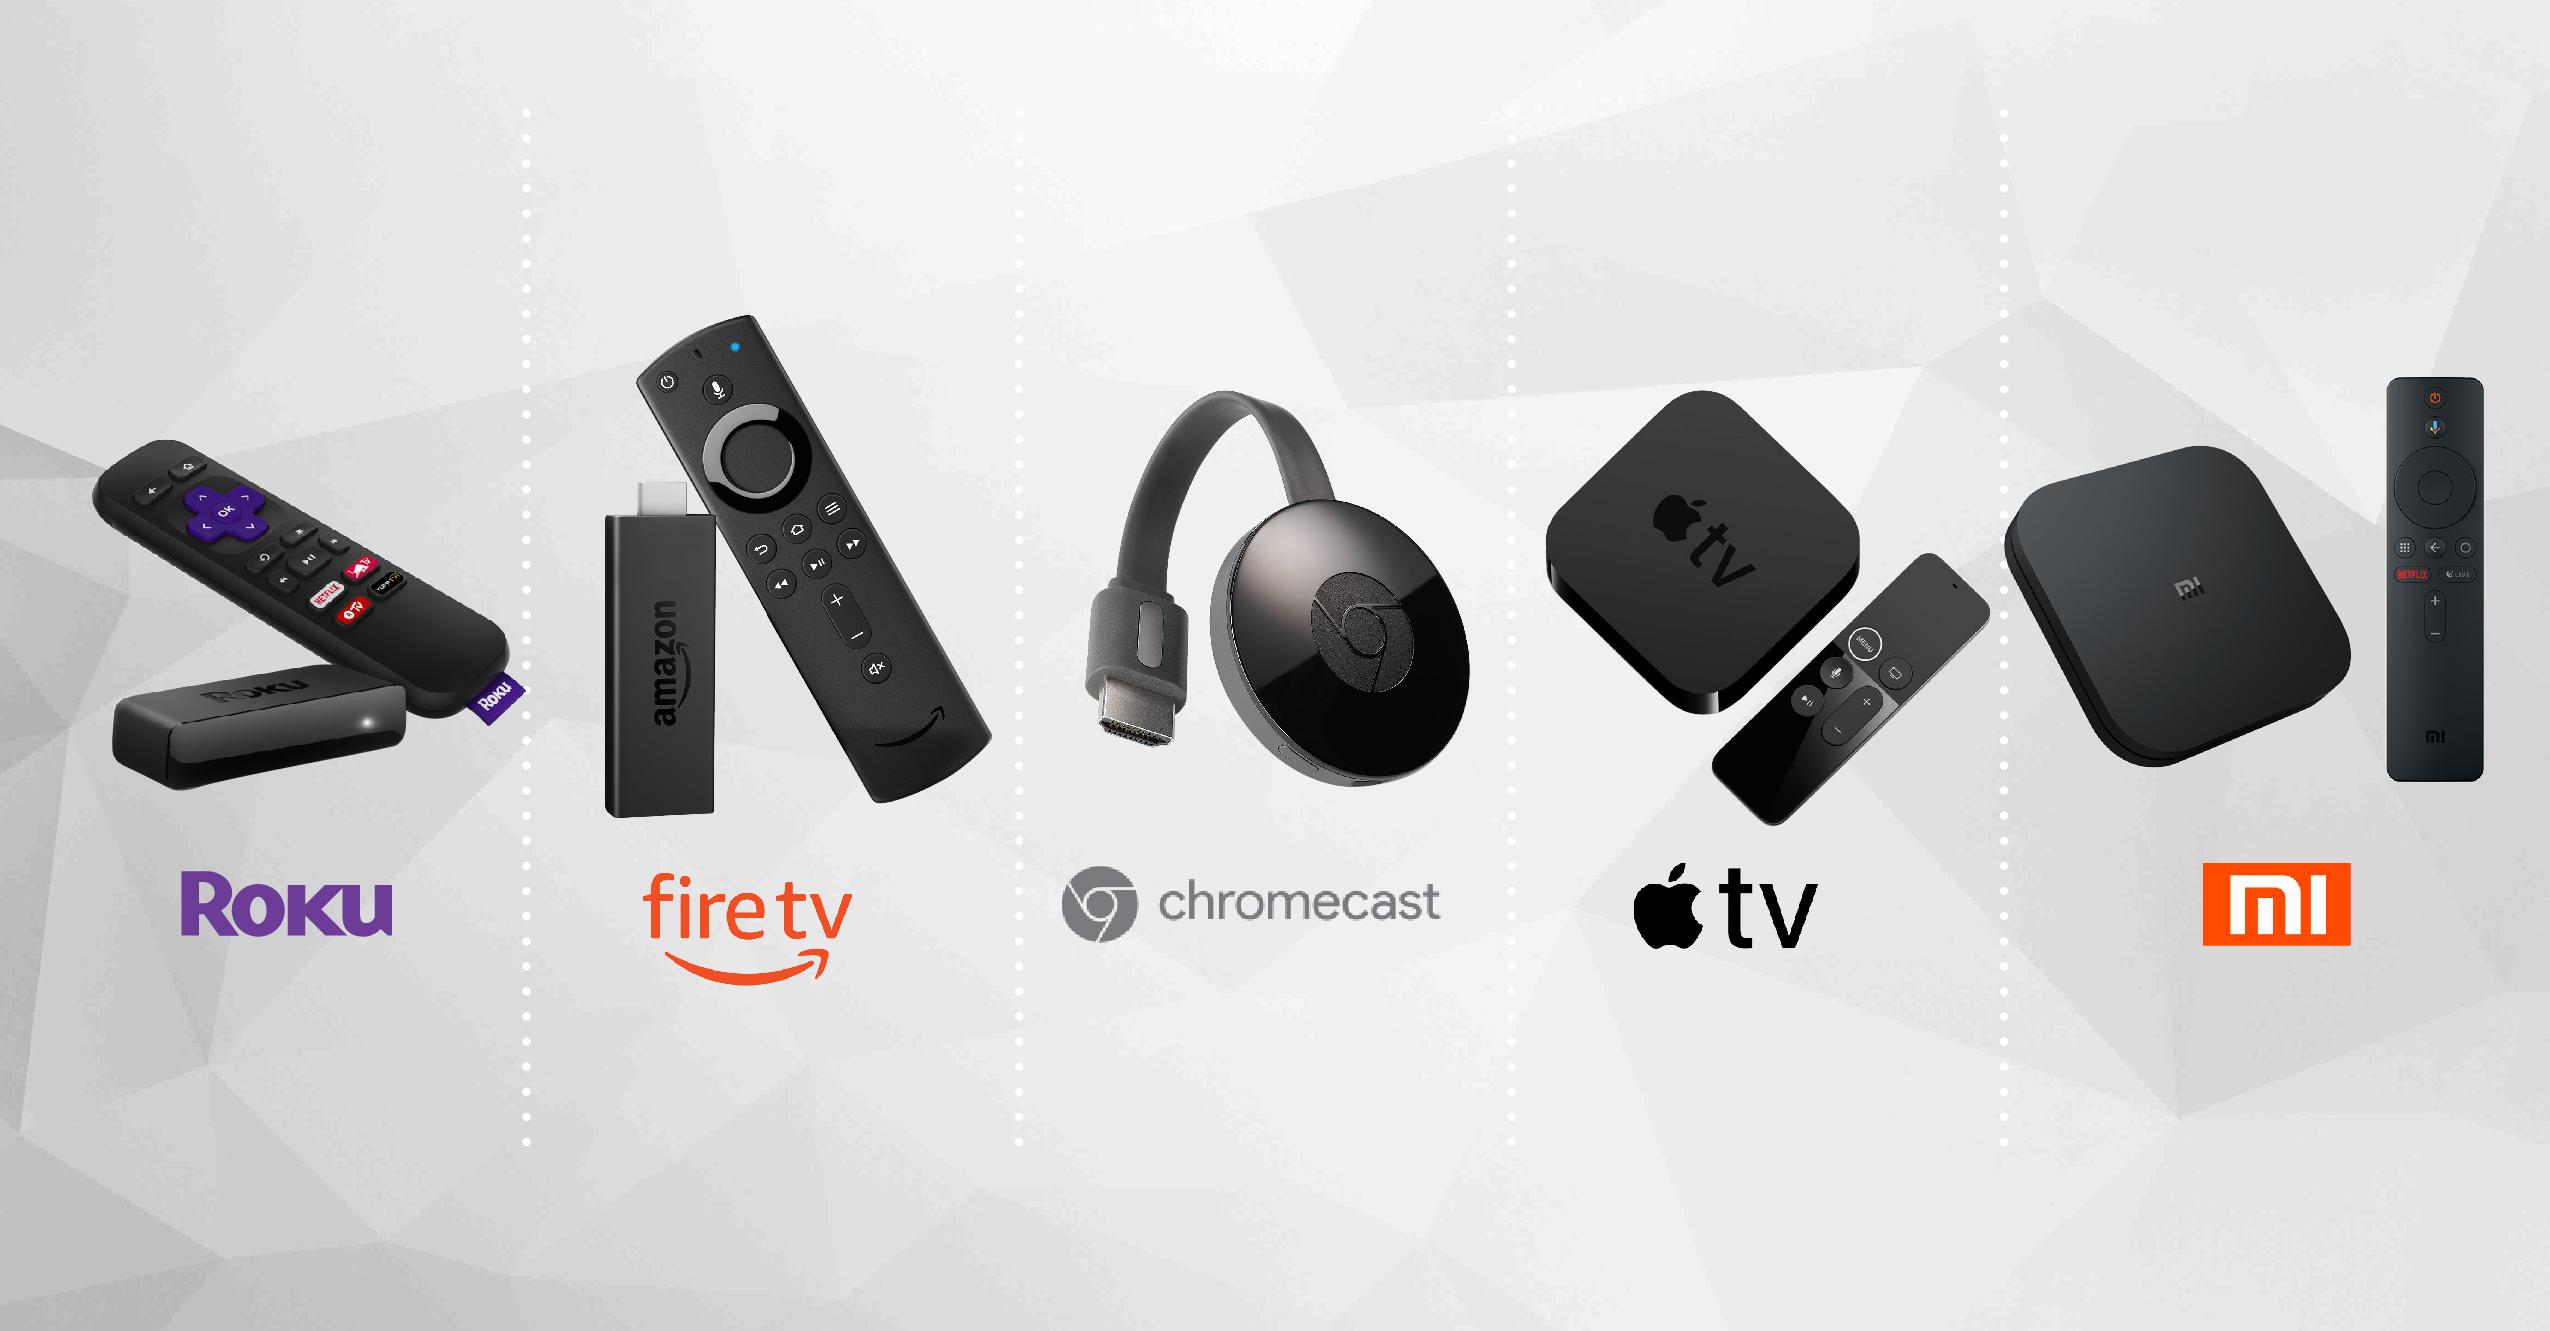 Roku Express vs Fire TV vs Chromecast vs Apple TV vs Mi Box S: What  Streaming Device Is Right for You? - Dignited